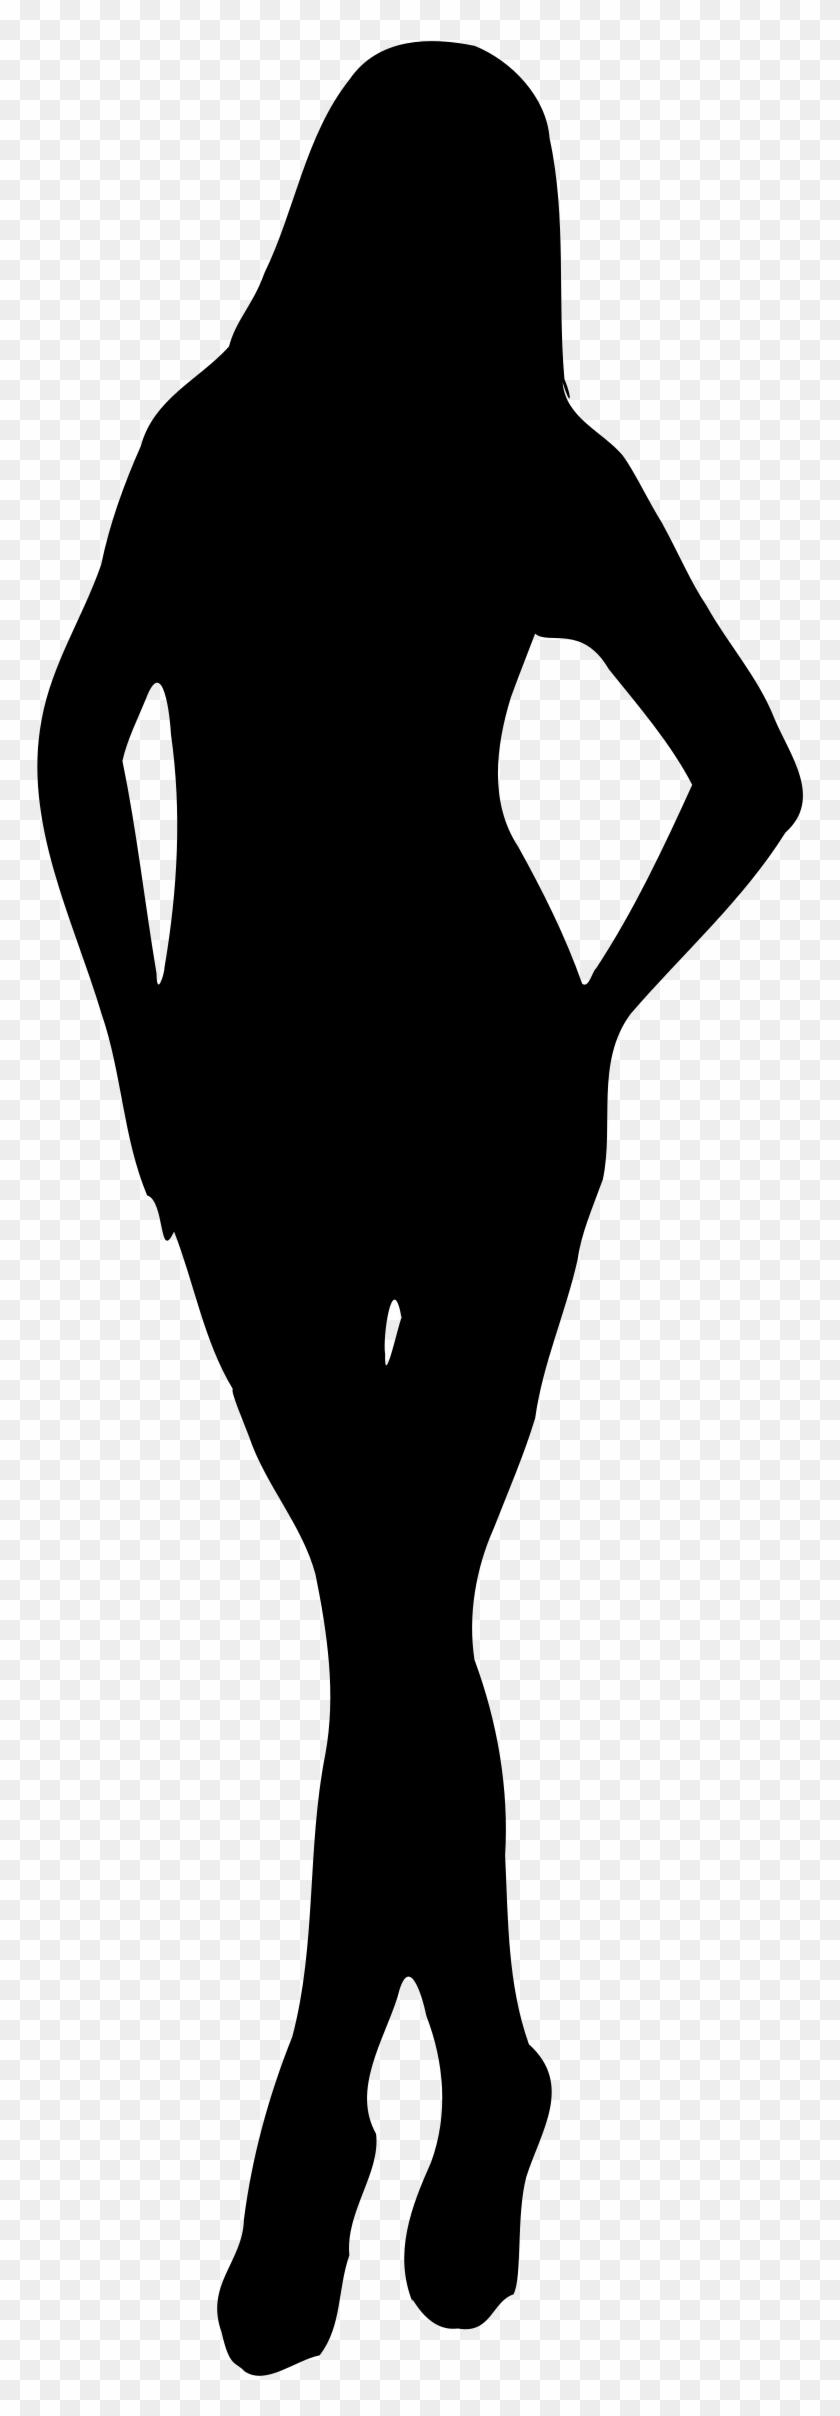 15660 Illustrated Silhouette Of A Beautiful Woman Pv - 3d Drucker Schokolade Kaufen #63663